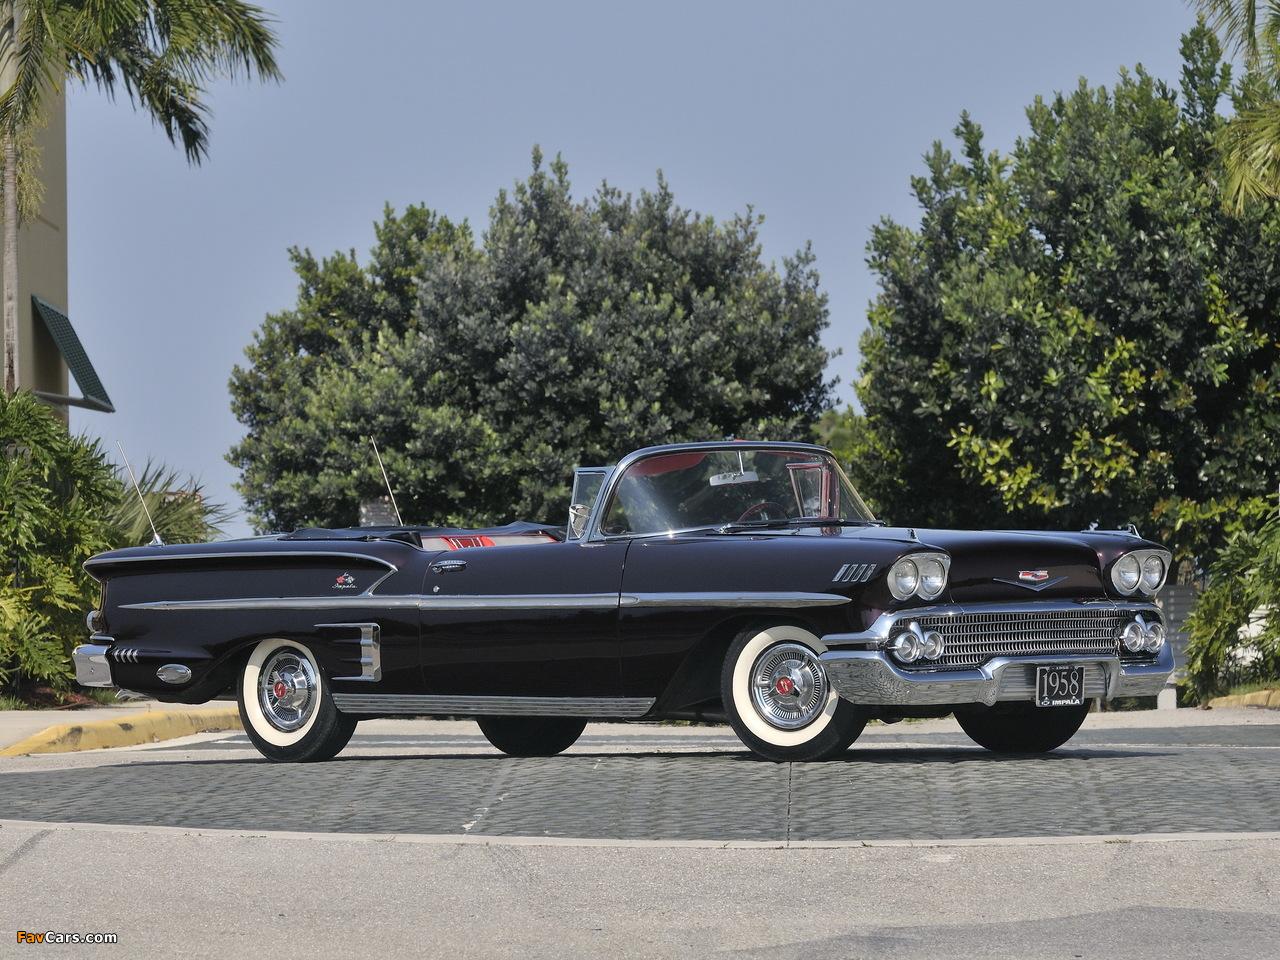 Chevrolet Bel Air >> Photos of Chevrolet Bel Air Impala 348 Super Turbo-Thrust Tri-Power Convertible 1958 (1280x960)